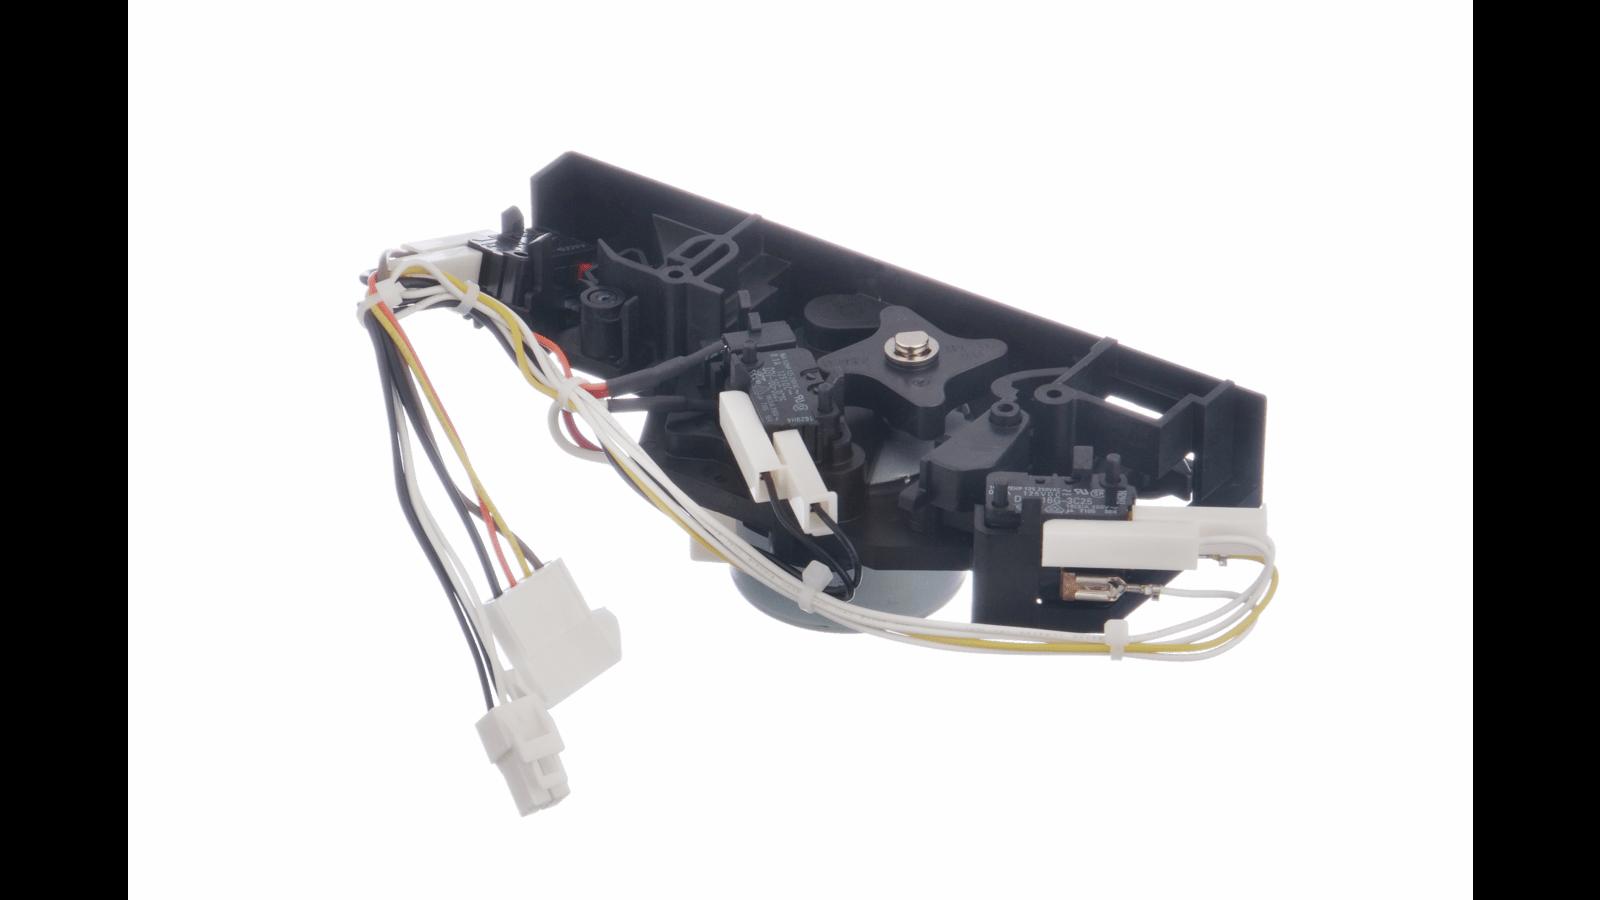 Lock for Bosch Siemens Microwave Ovens - 00651126 BSH